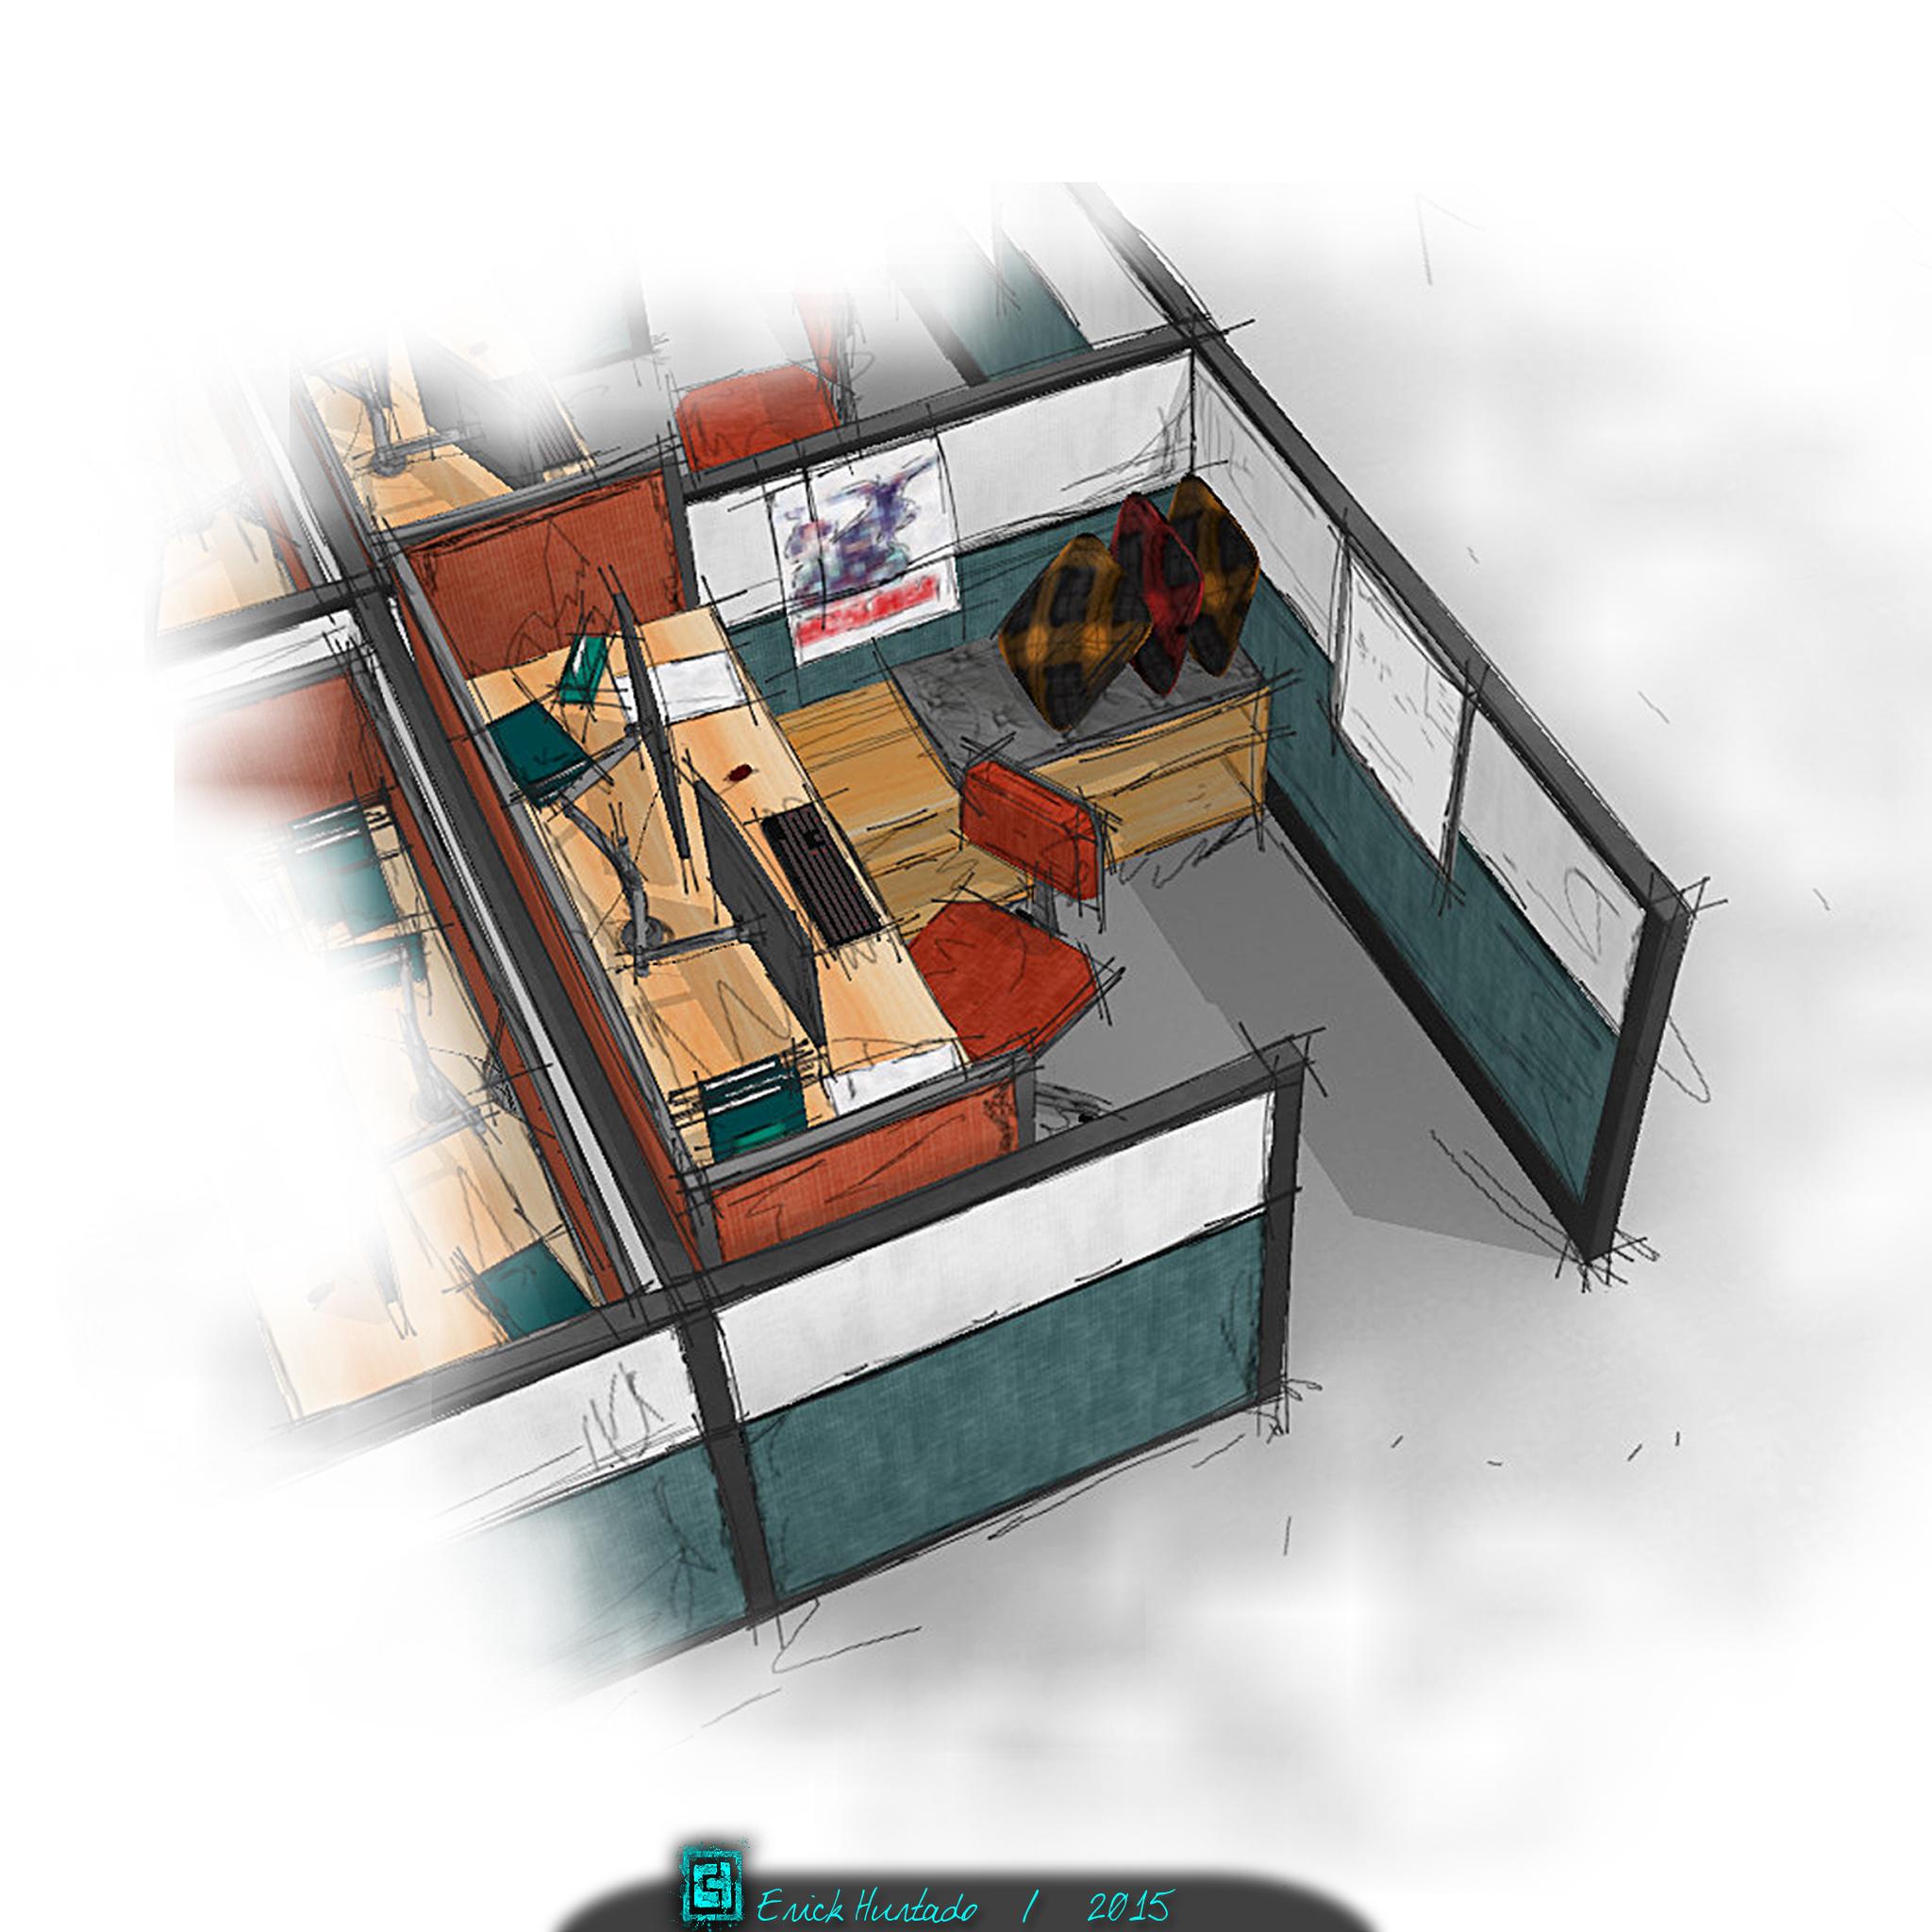 ewHurtado_OfficeSpace_02.jpg